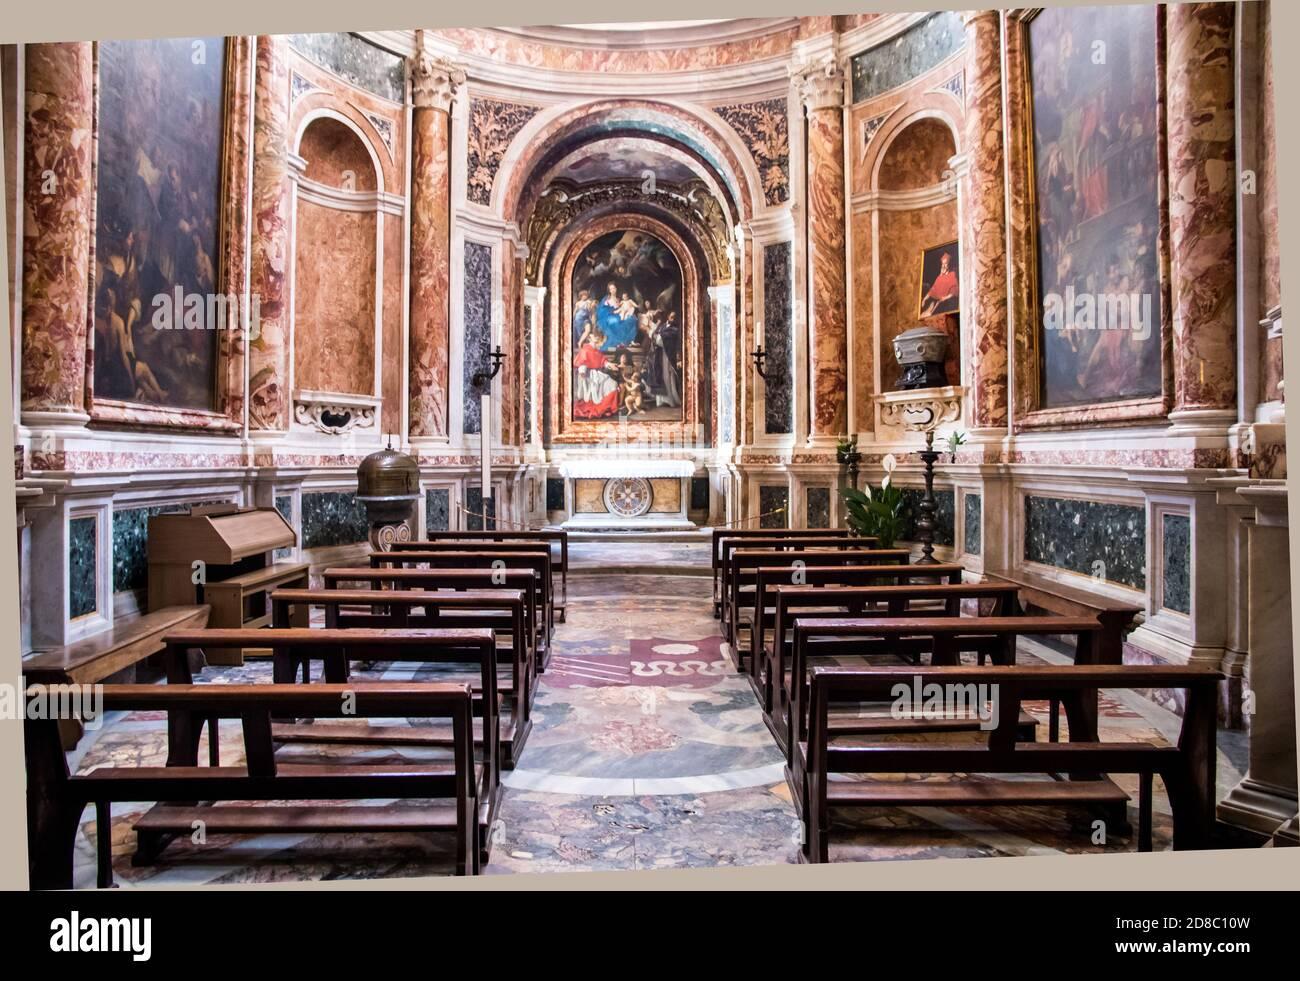 Chiesa Nuova auch bekannt als Santa Maria in Vallicella in Rom Italien Stockfoto